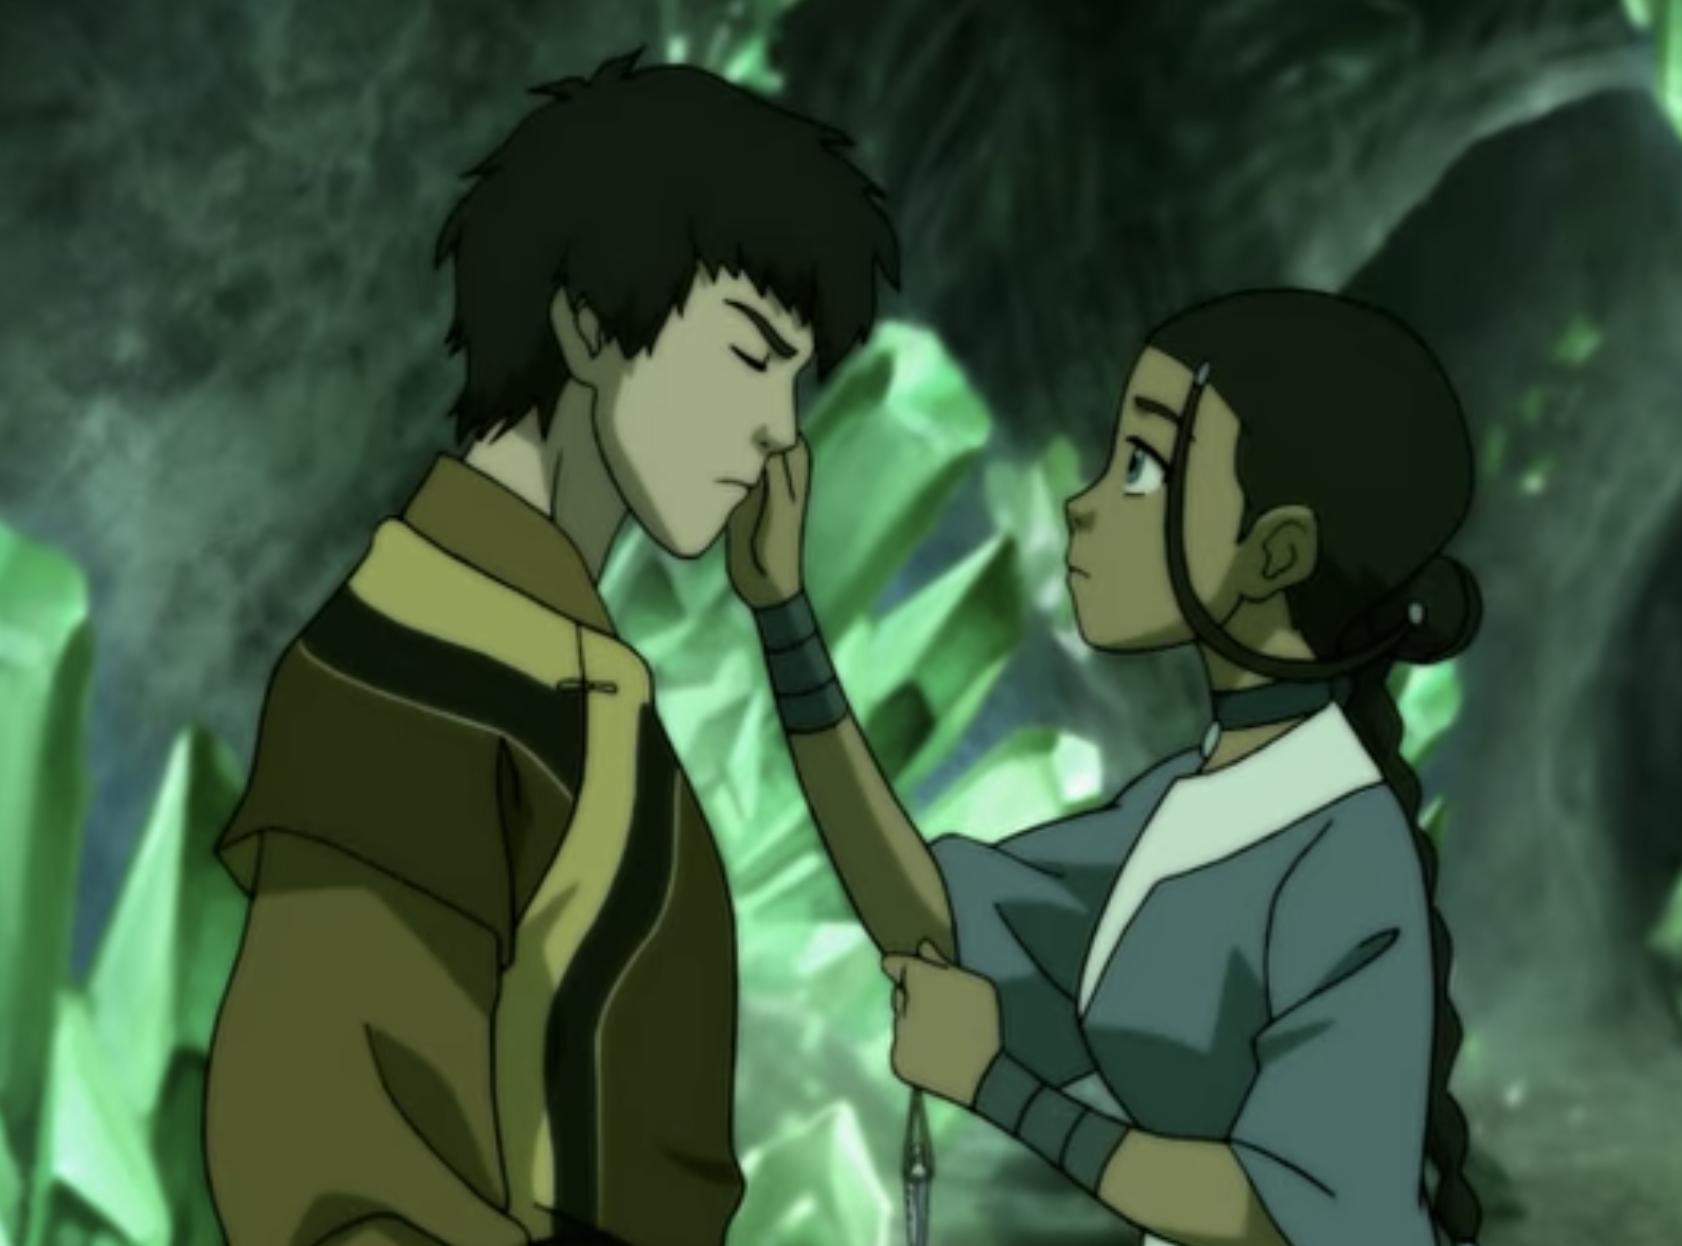 Katara touching the side of Zuko's face.